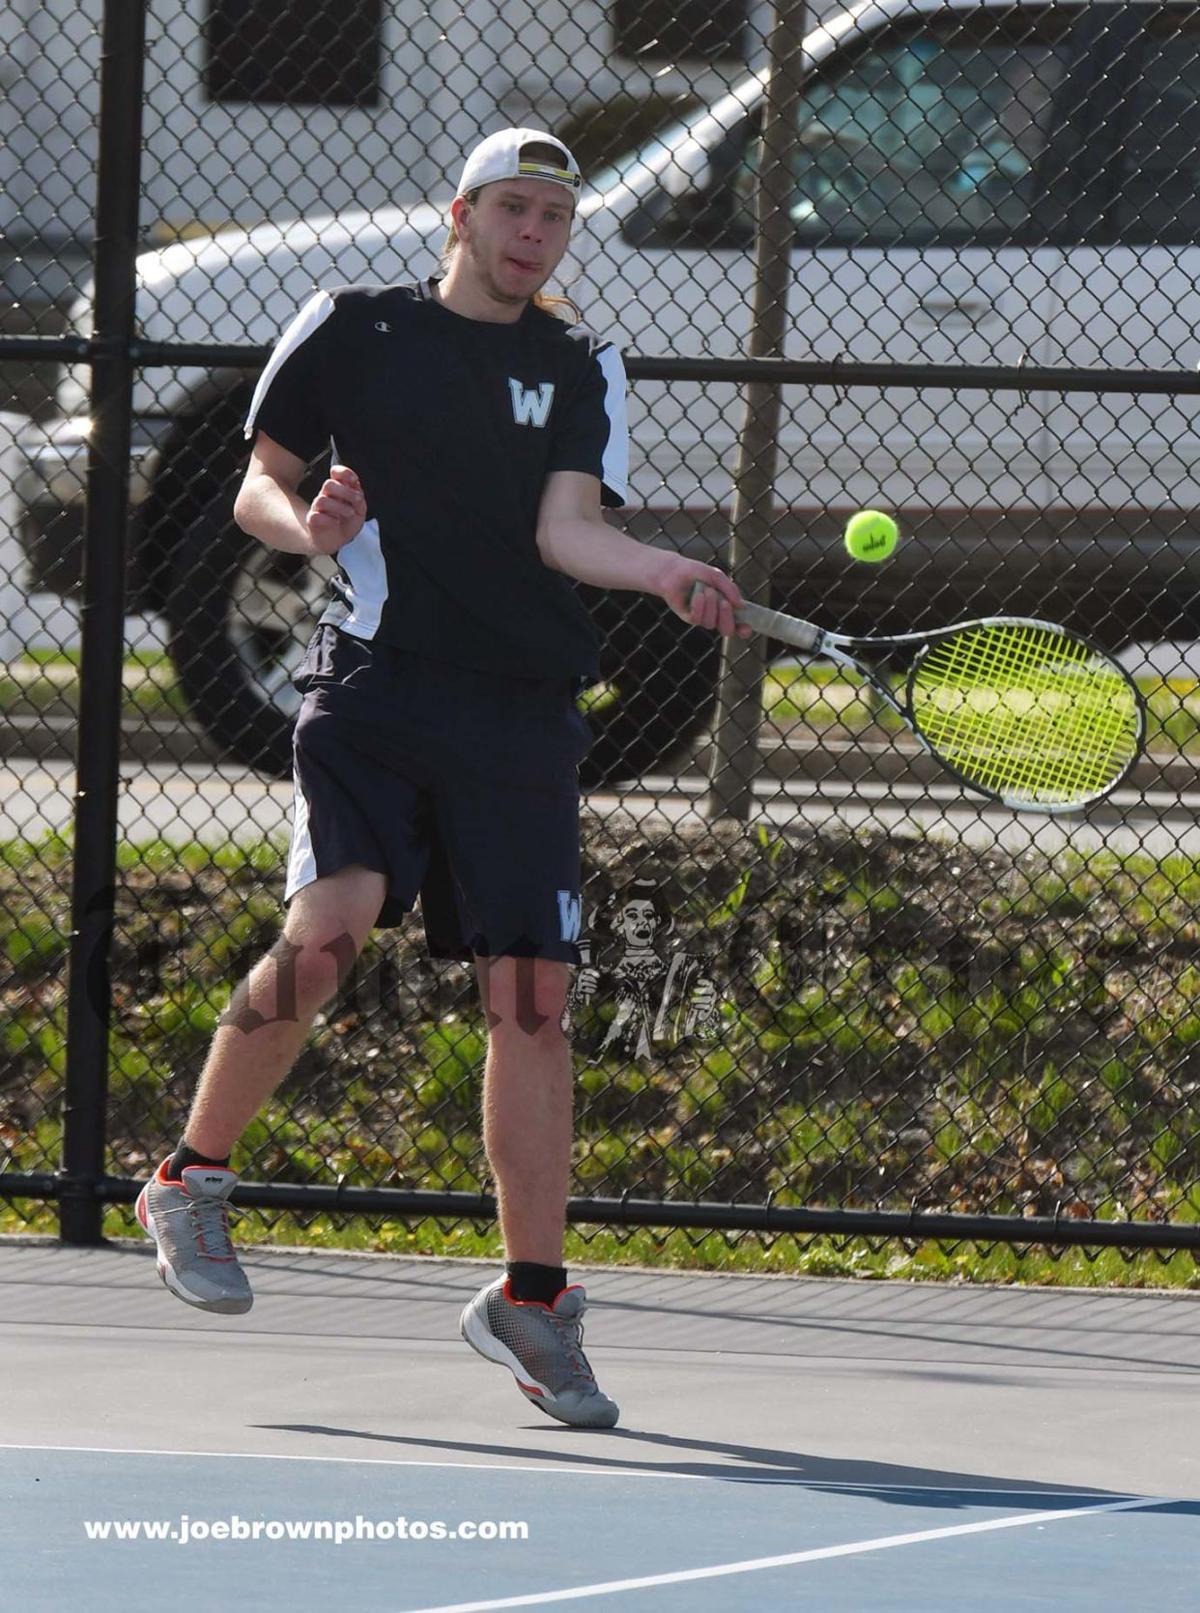 Evan Meyers of the WHS Boys Tennis All-Decade team